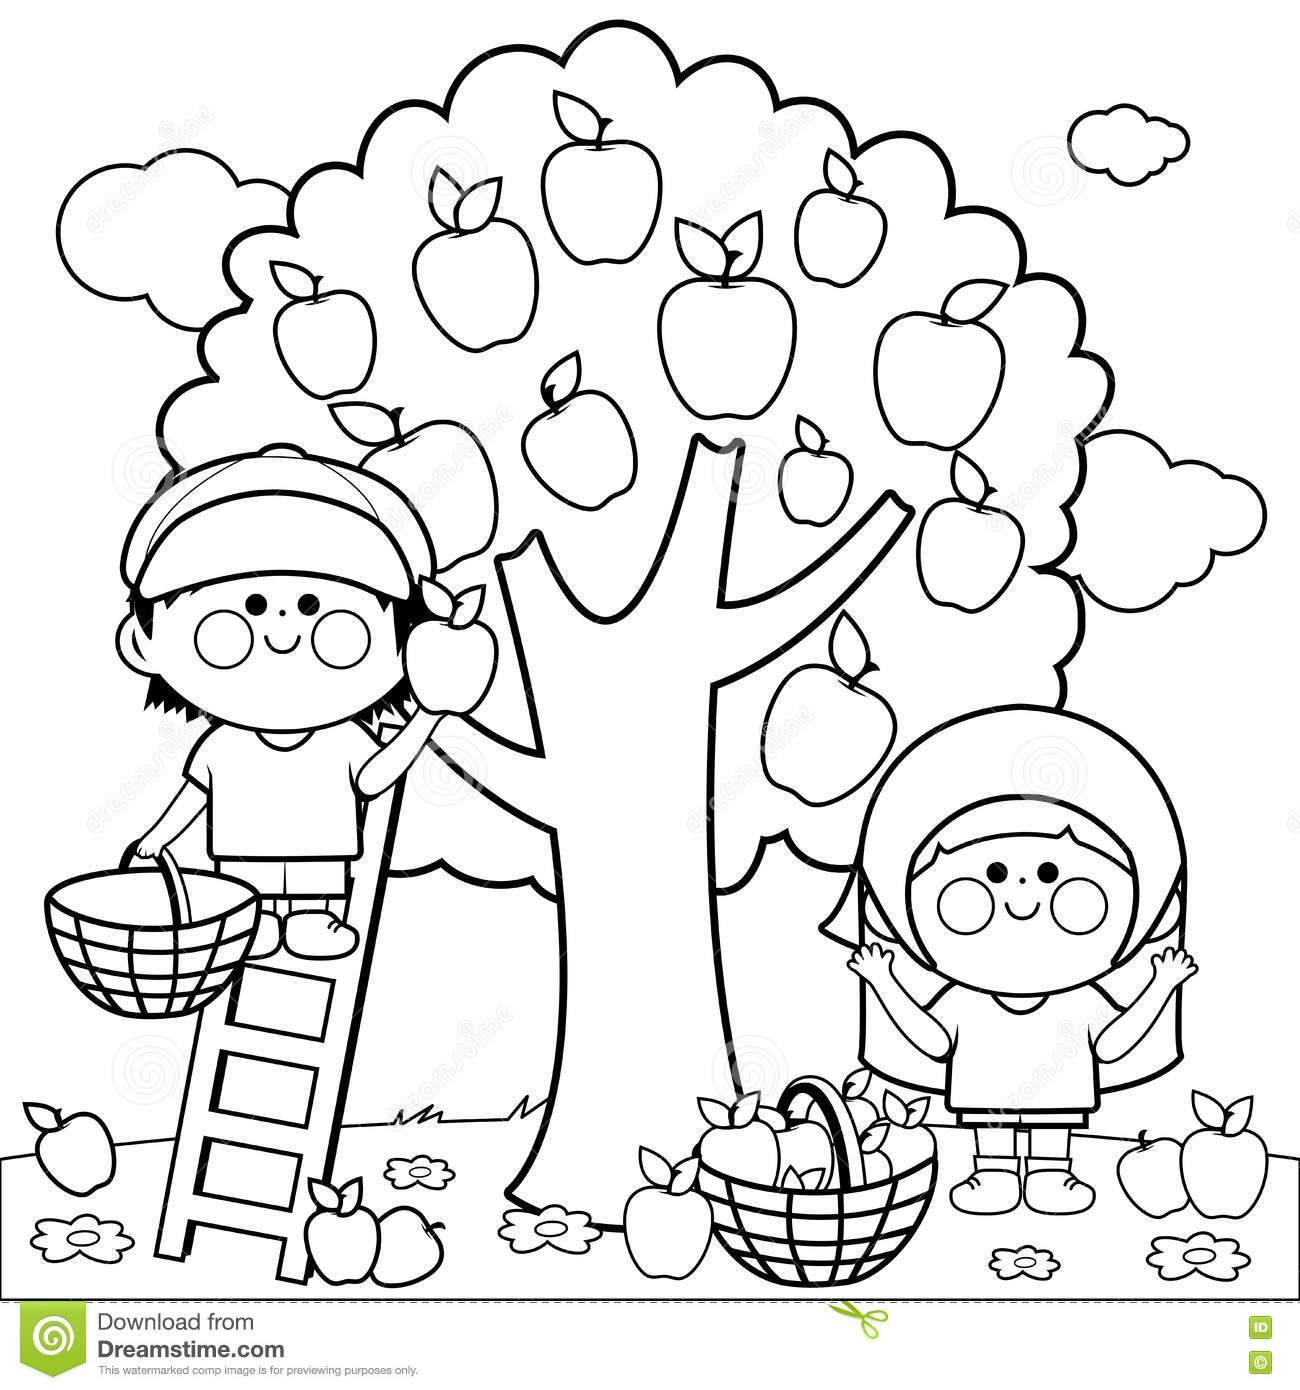 Black and white clipart of children picking apples clip art black and white stock Apple Picking Clipart Black And White clip art black and white stock